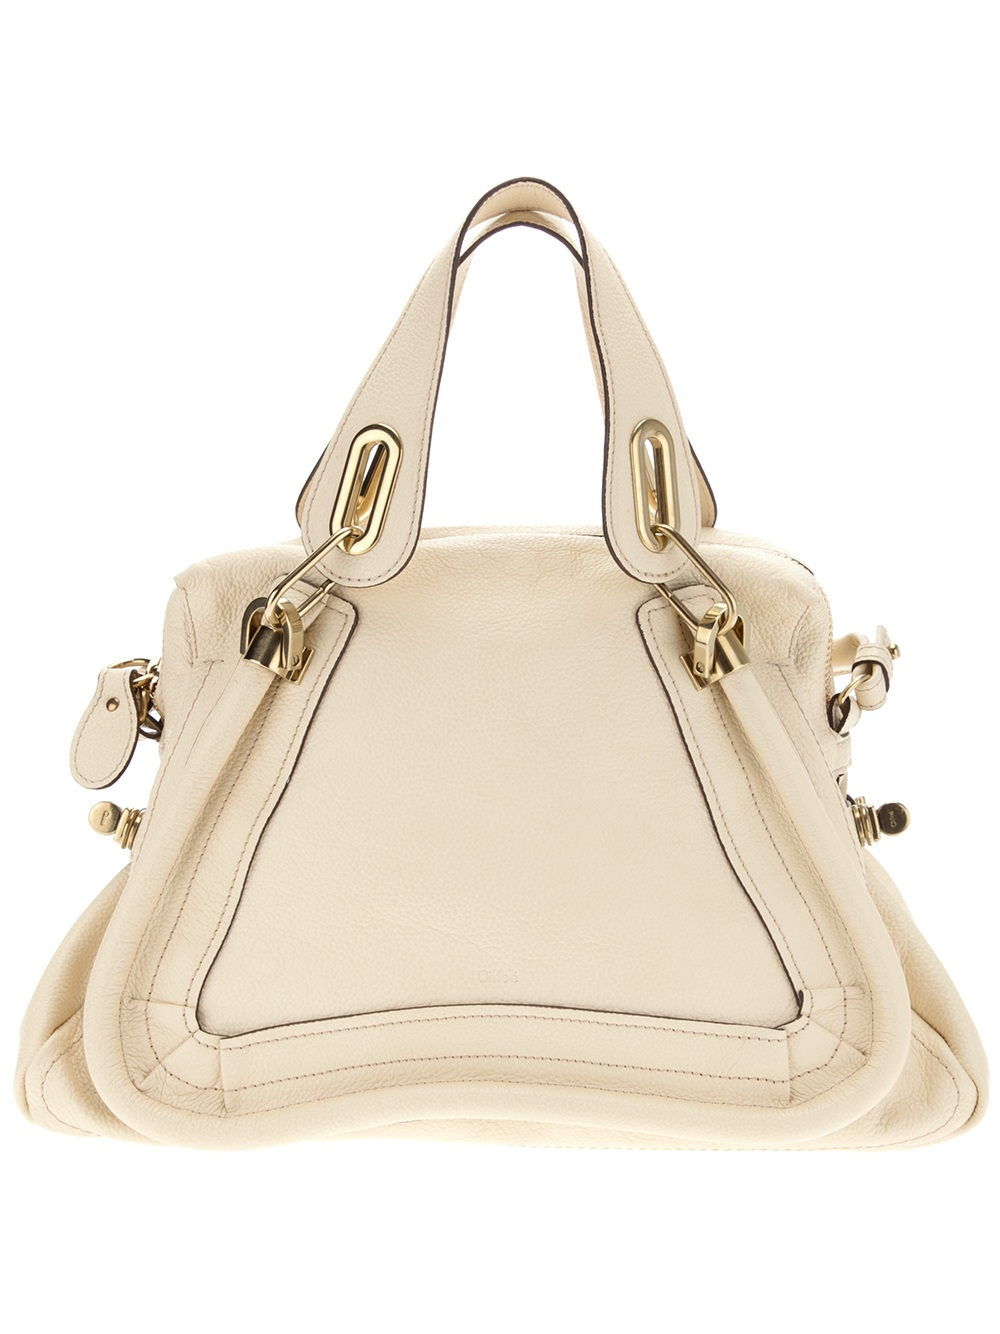 Chlo¨¦ Paraty Calf Leather Shoulder Bag in Beige (cream) | Lyst